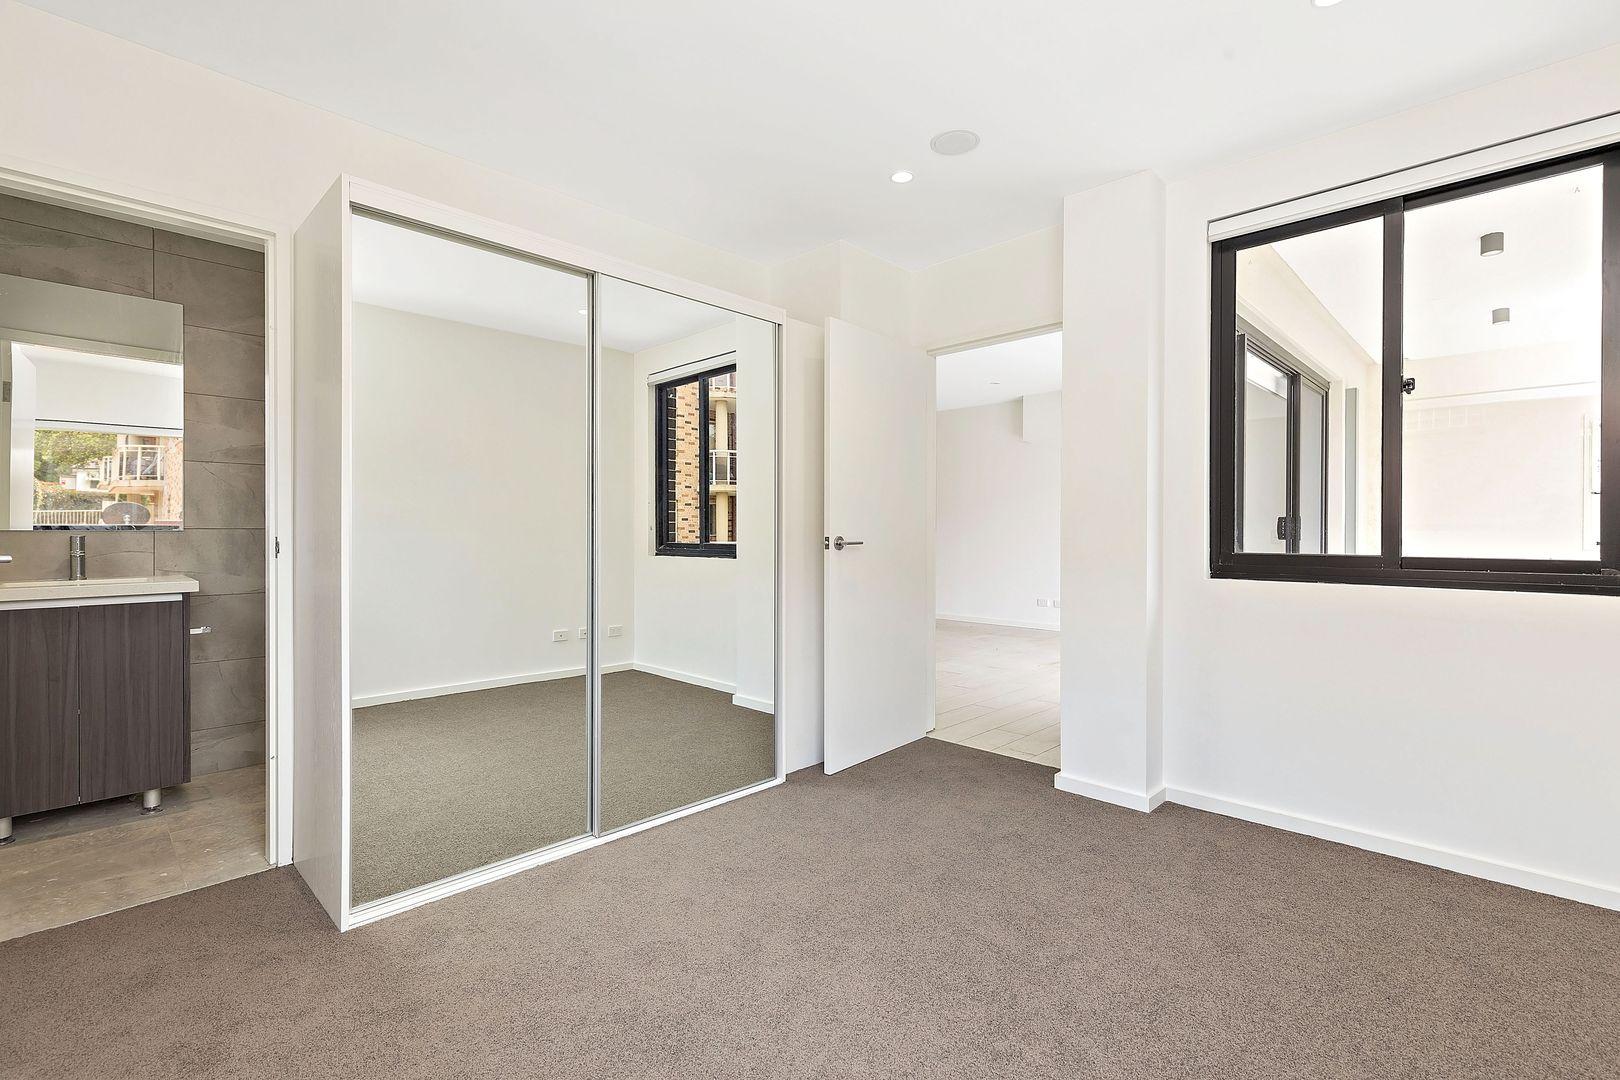 13/2-4 Morotai Avenue, Riverwood NSW 2210, Image 2